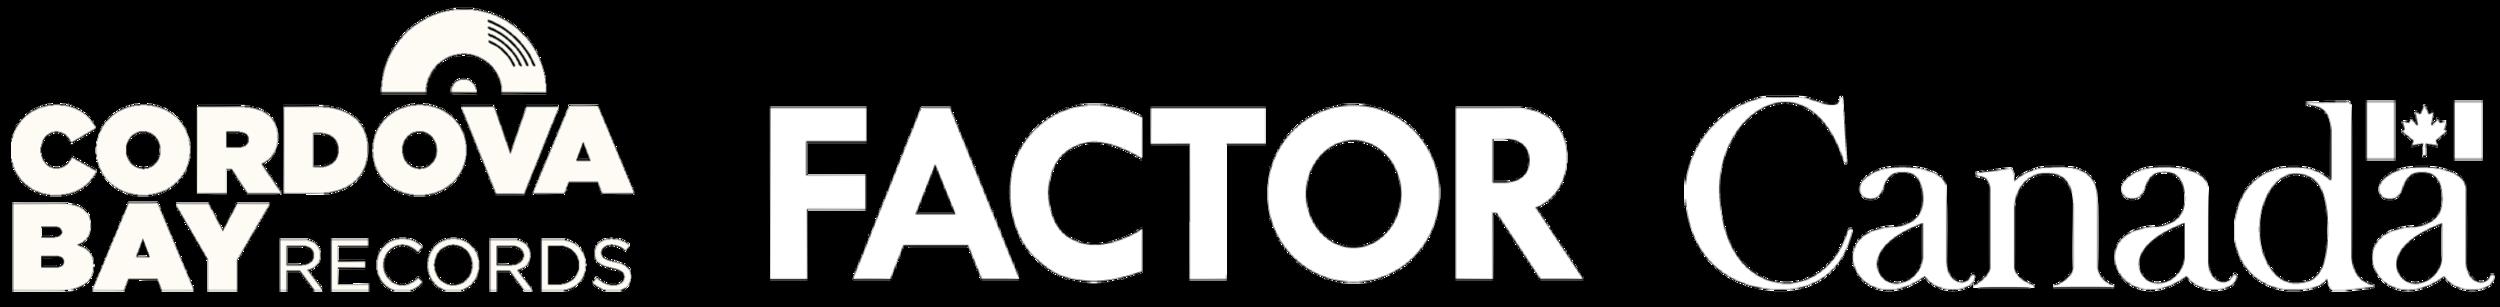 Cordova_Factor_Canada.png